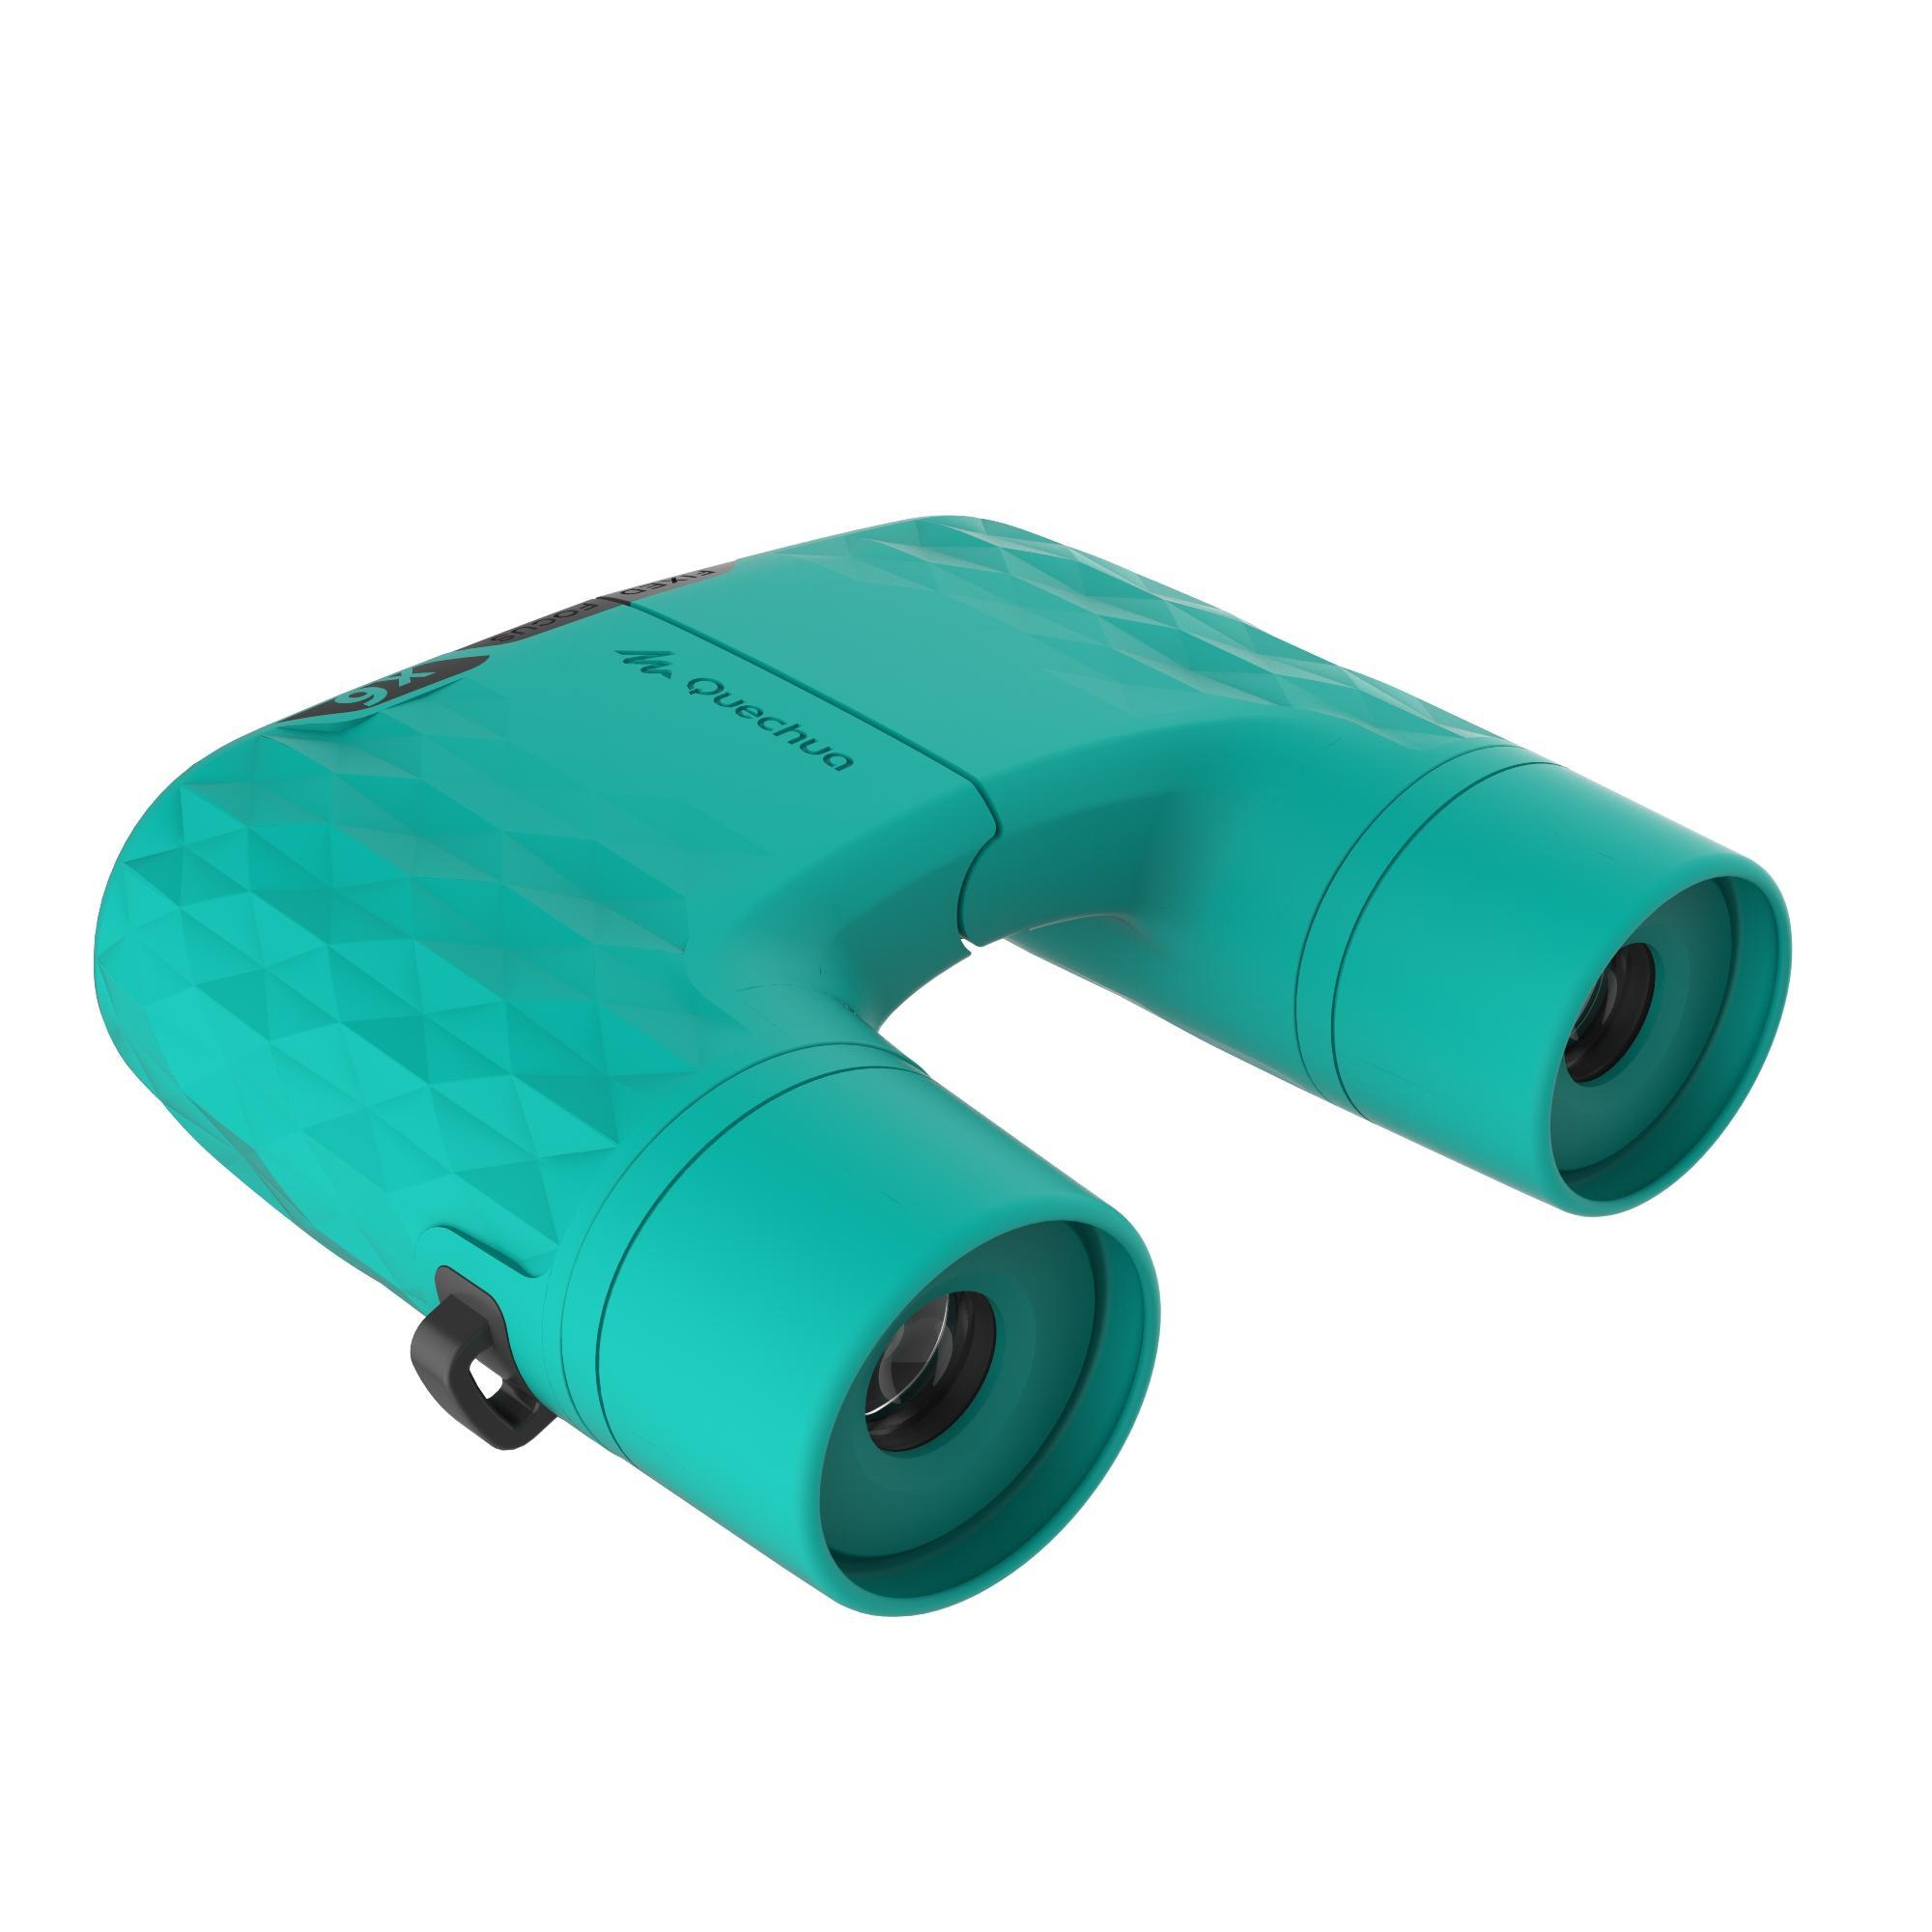 MH B 100 Fixed Focus Adult Hiking x6 Magnification Binoculars - Green